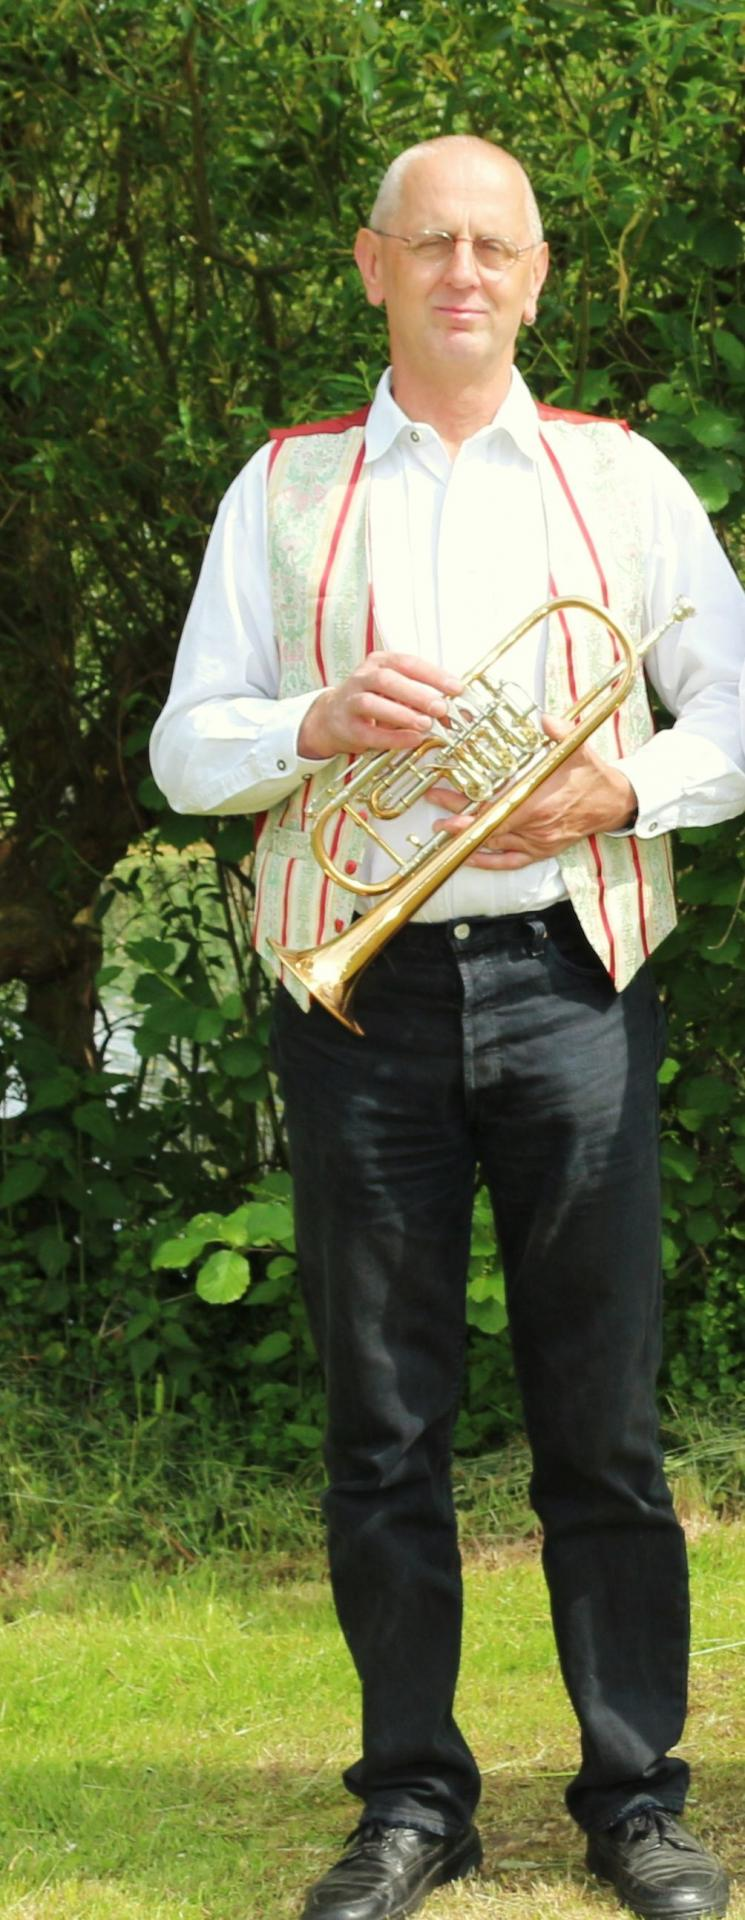 Dirk Haub